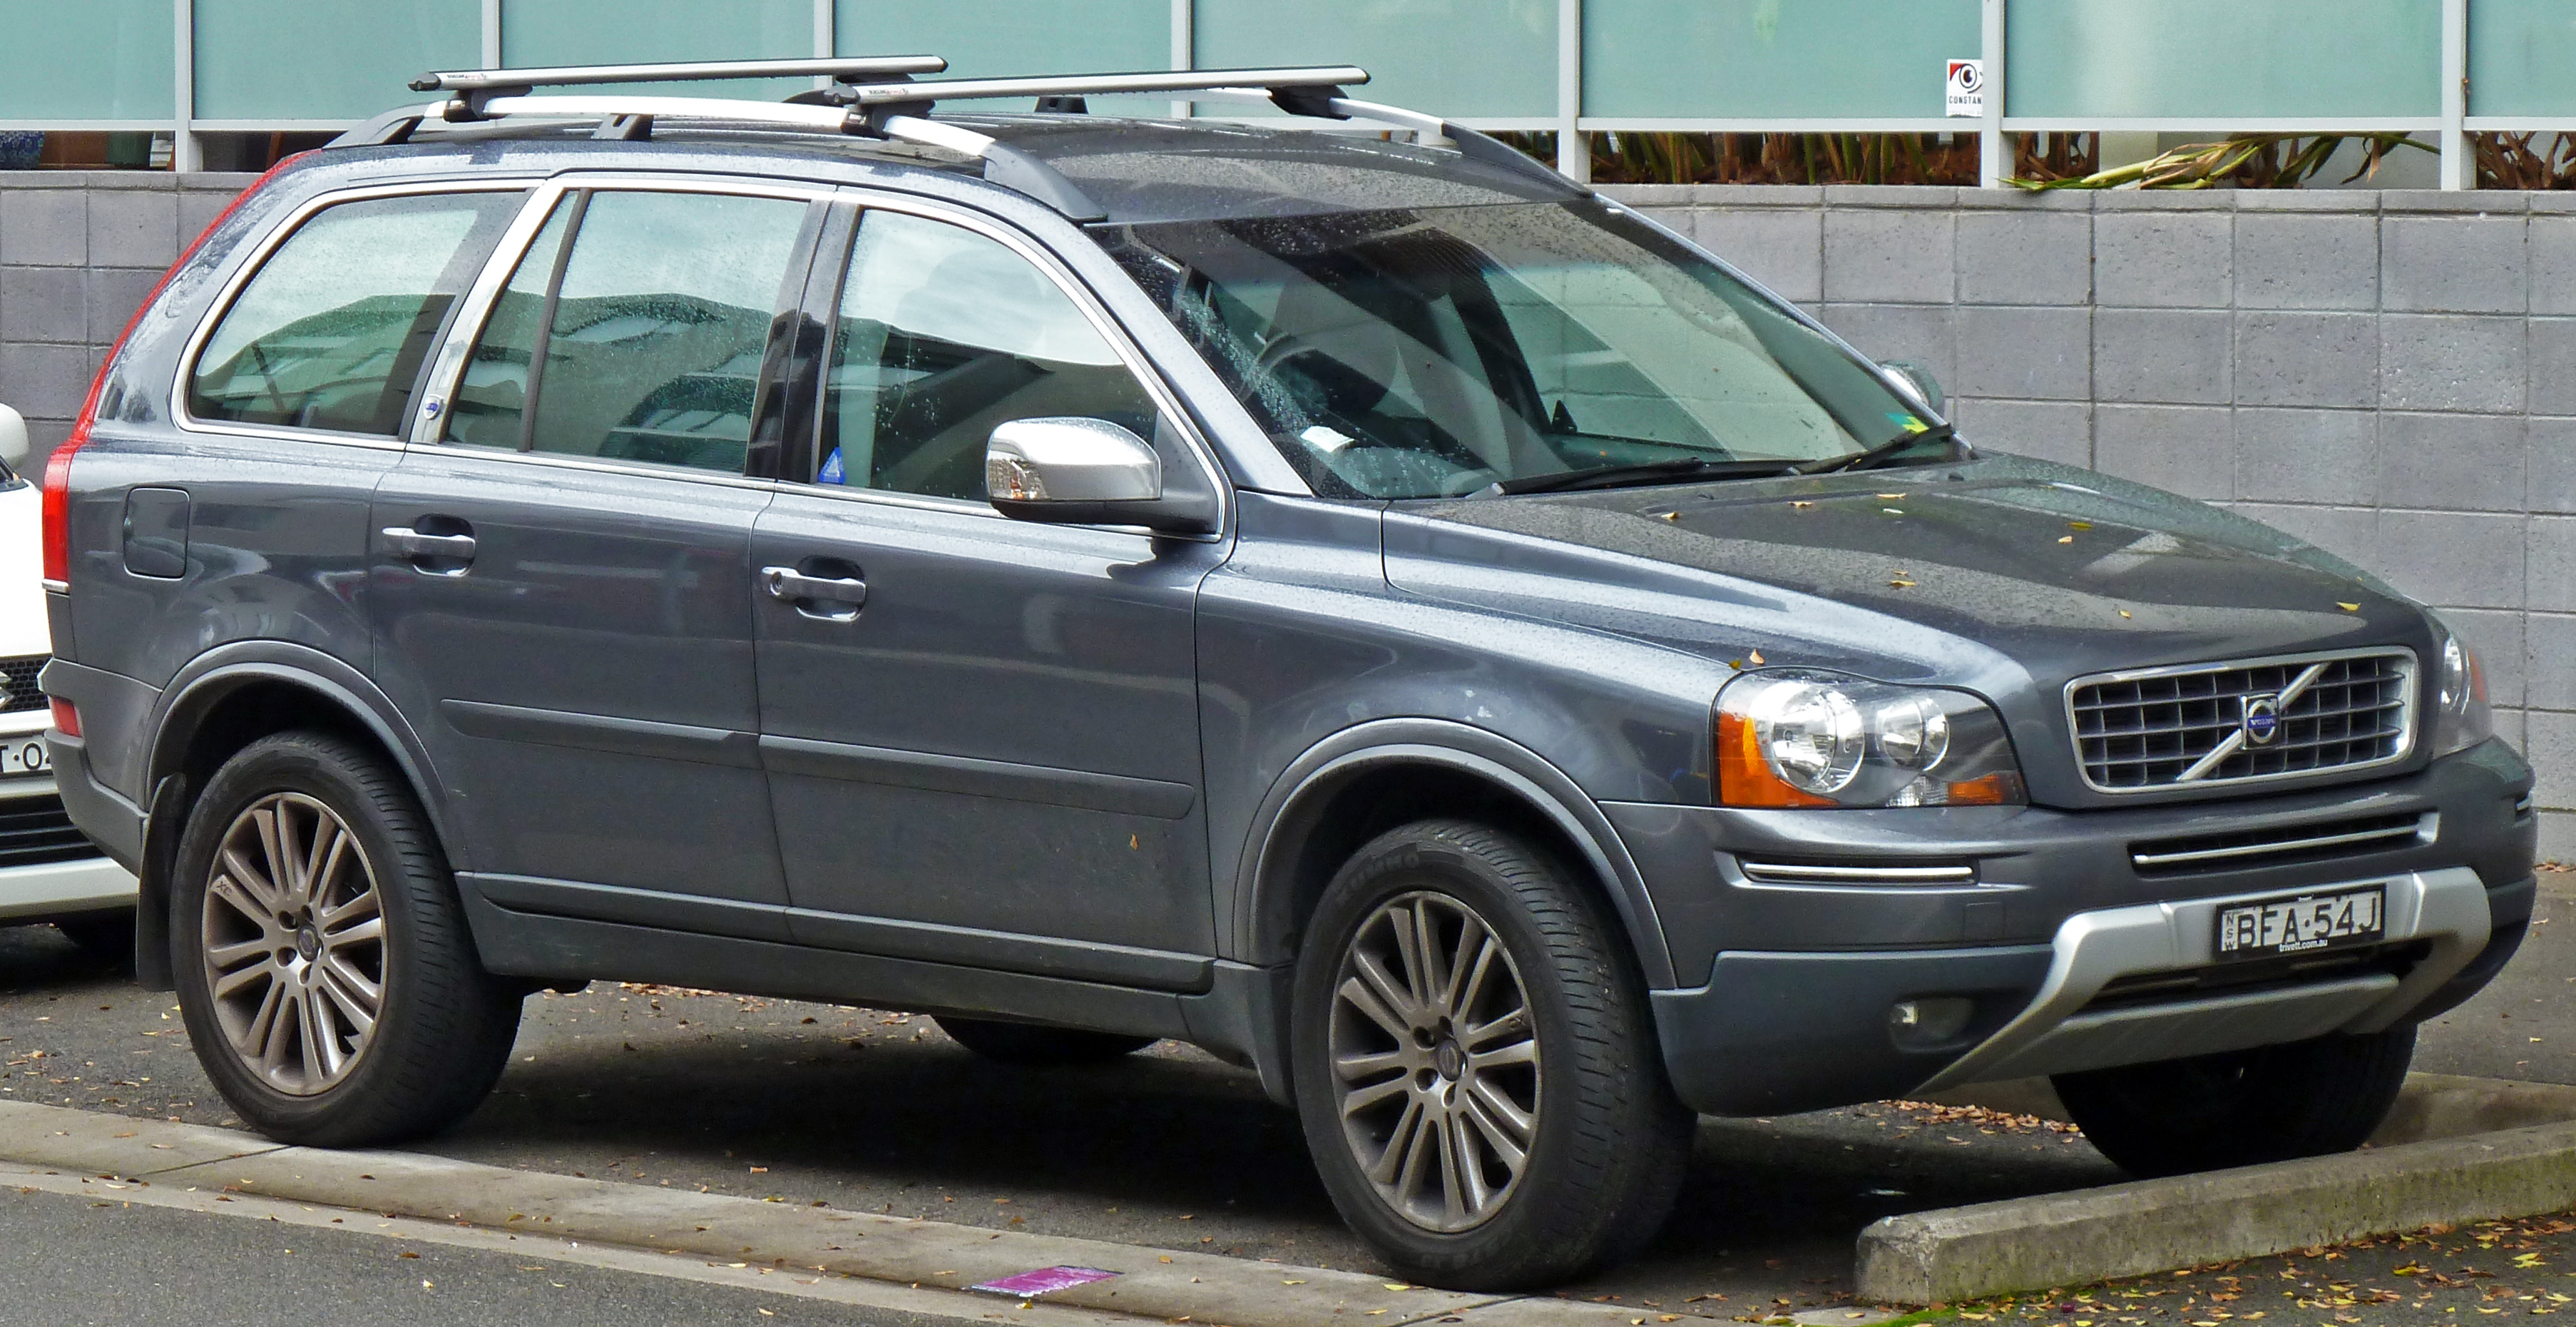 File 2008 Volvo Xc90 P28 My08 D5 Wagon 2010 07 13 01